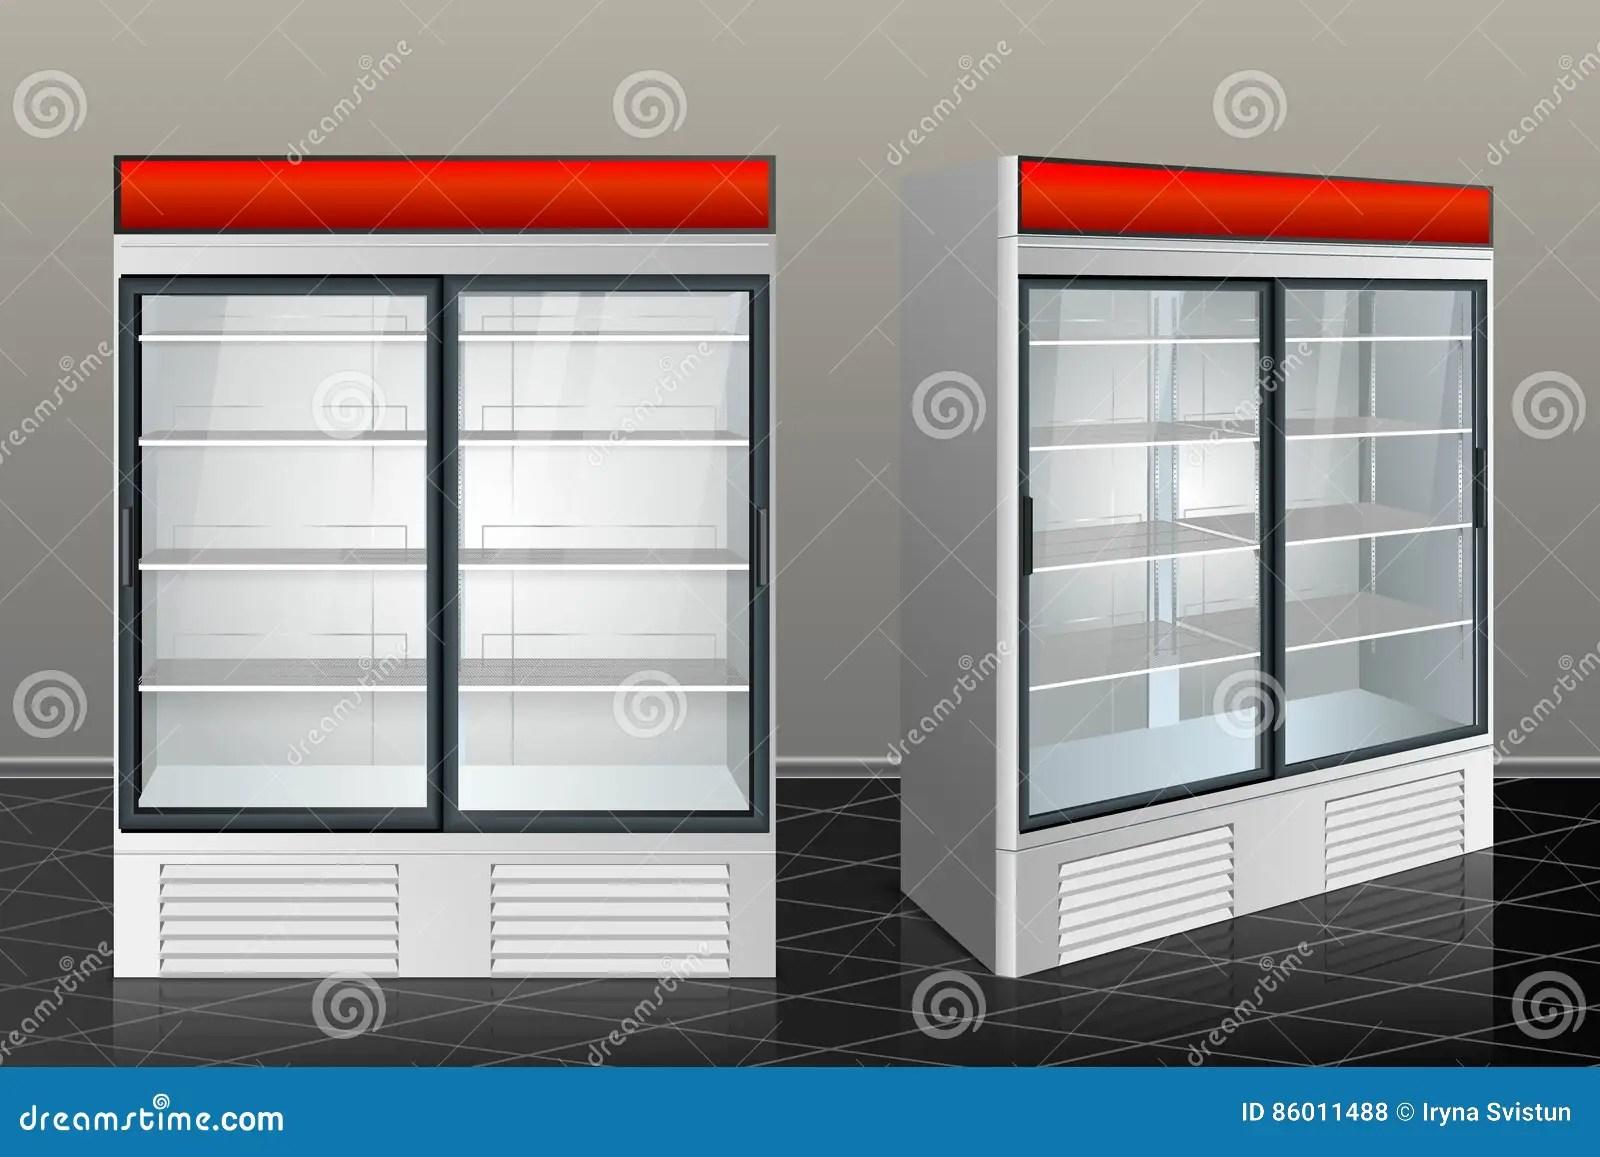 kitchen showrooms air 冰箱陈列室厨房库存例证 插画包括有产品 饮食 传感器 查出 磁铁 冰箱陈列室厨房